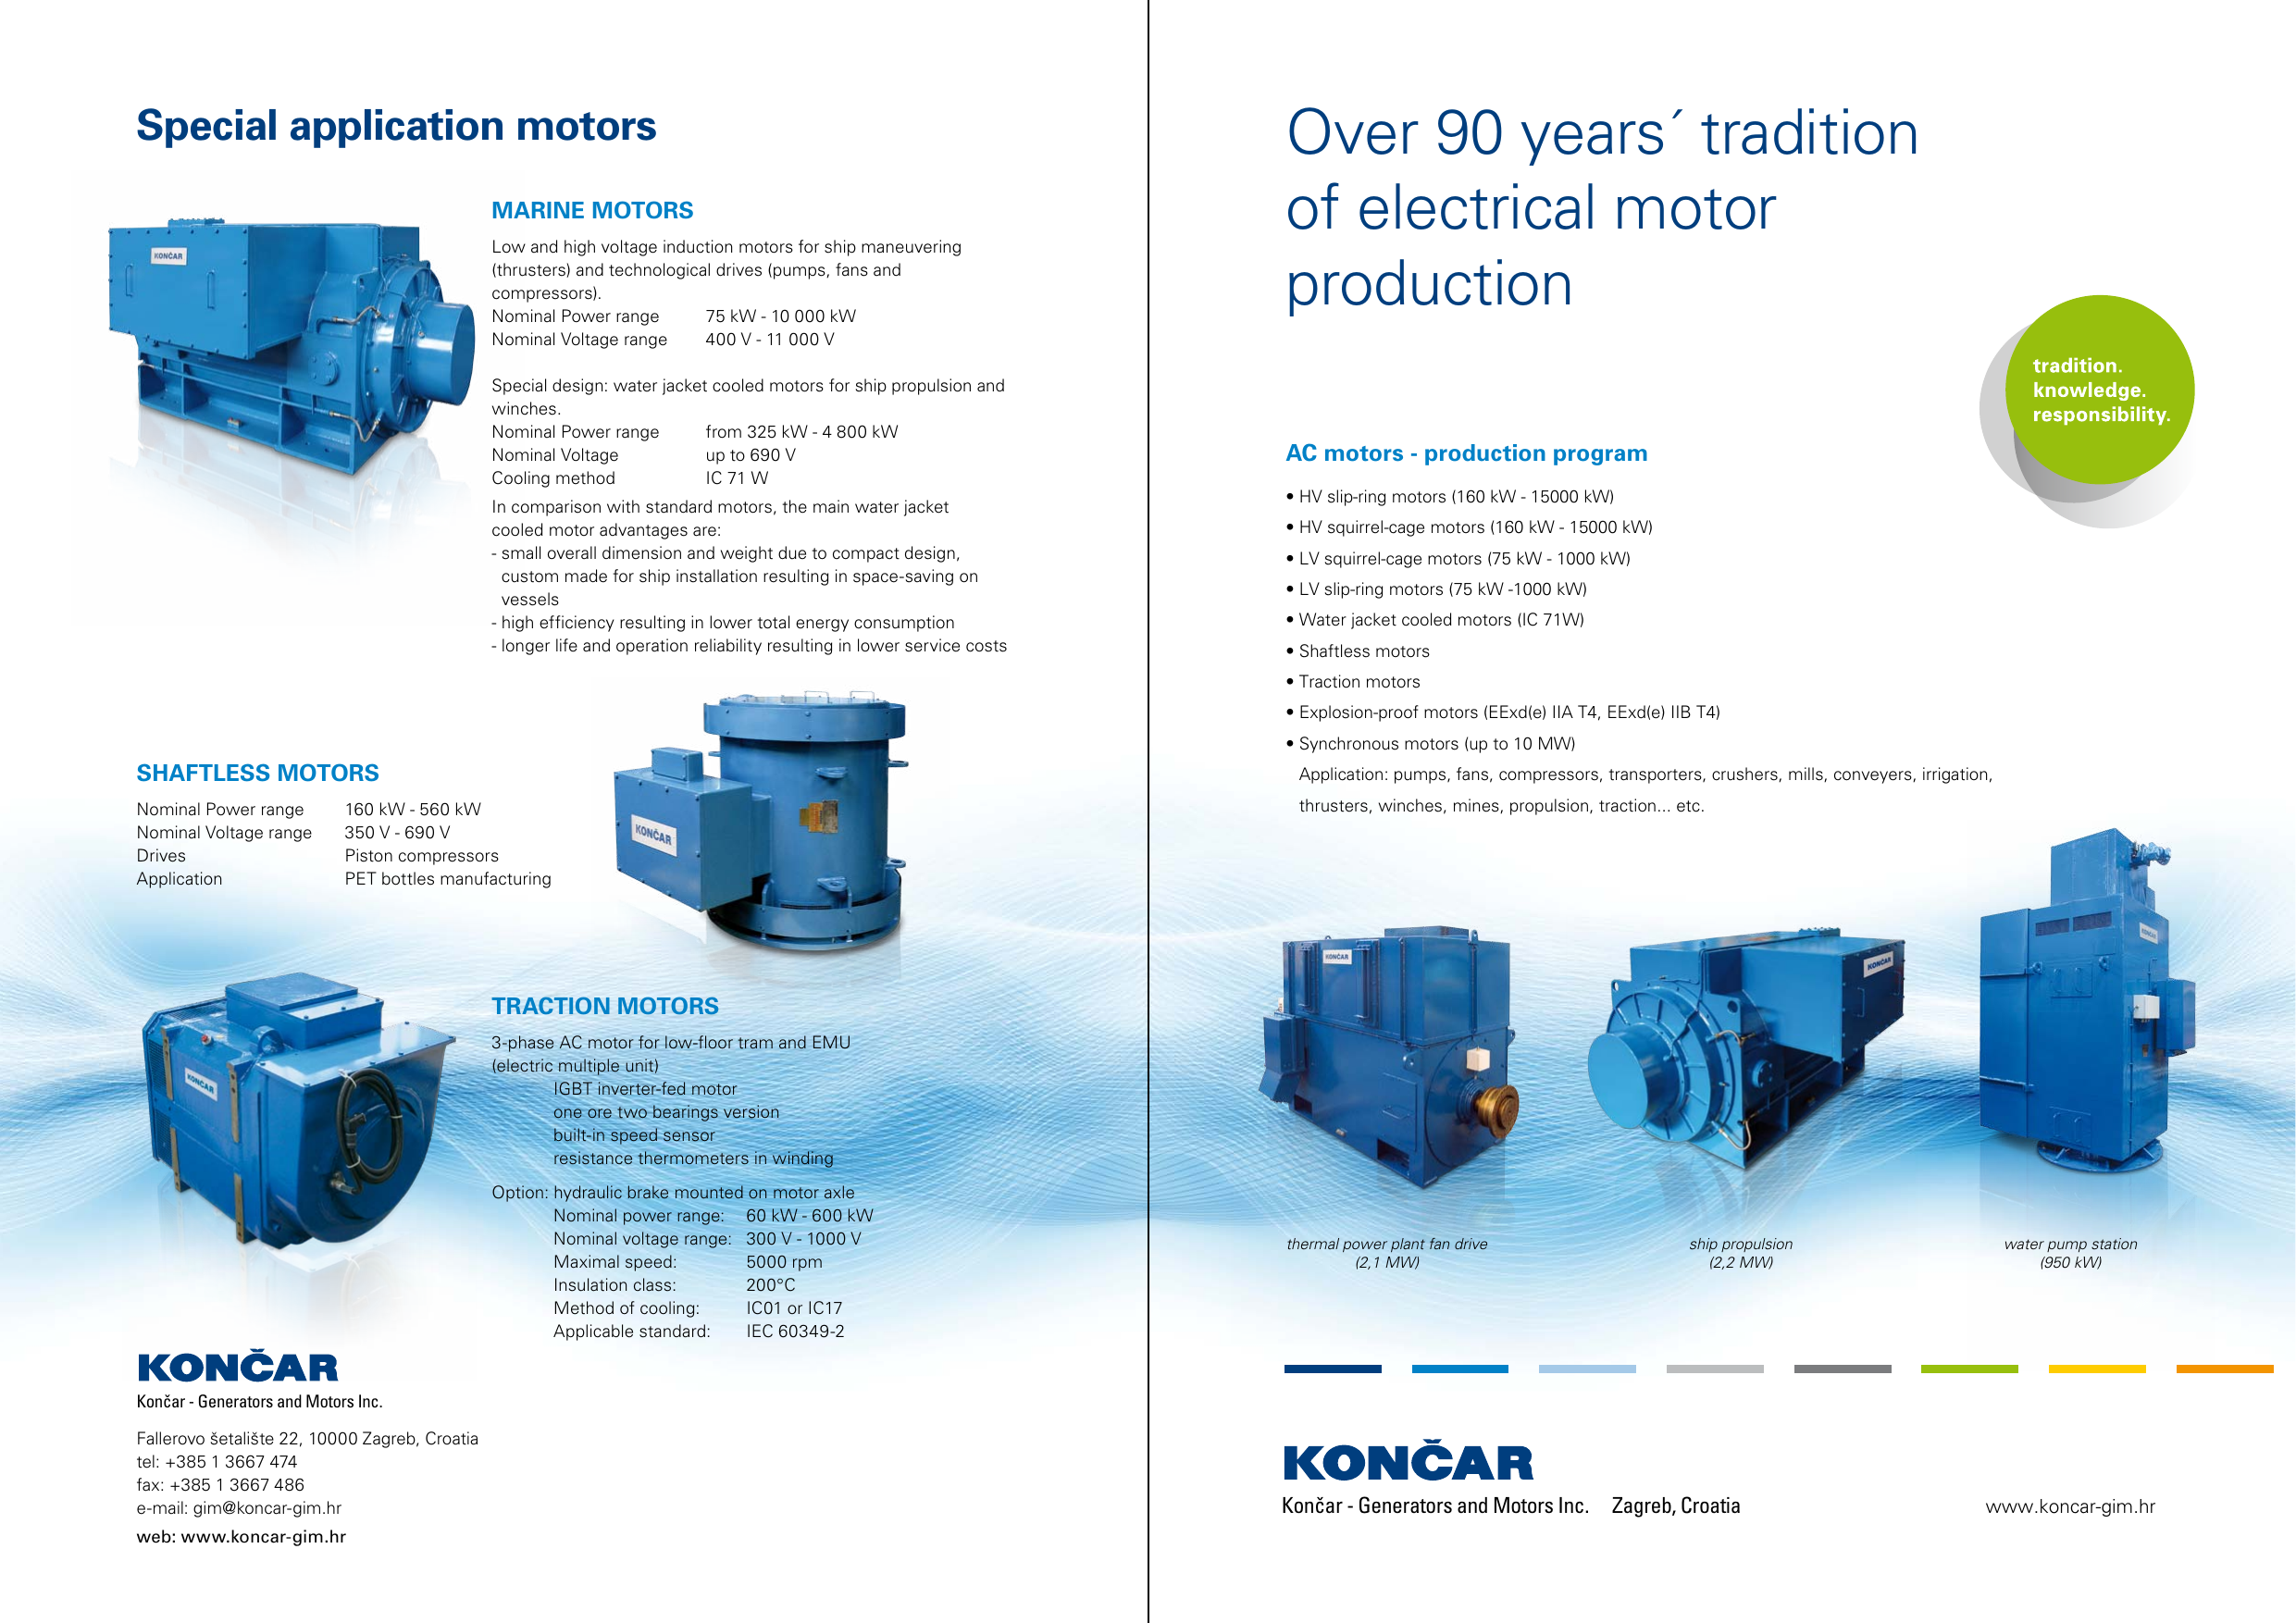 Končar-GIM motors - Končar Generators and Motors Inc